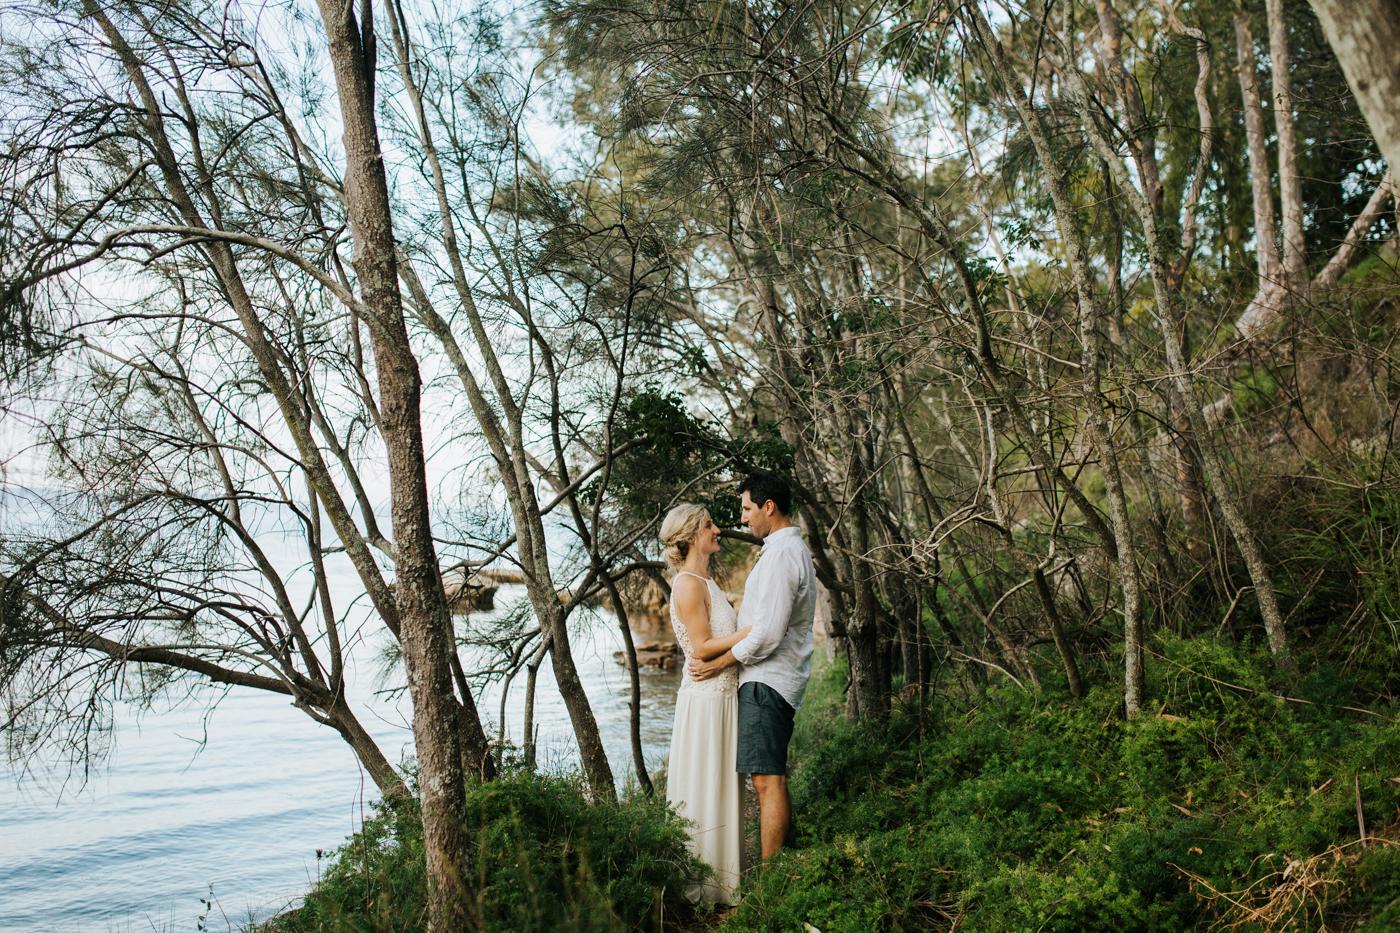 Emma & Ben - Lake Macquarie - Hunter Valley Wedding - Samantha Heather Photography-203.jpg